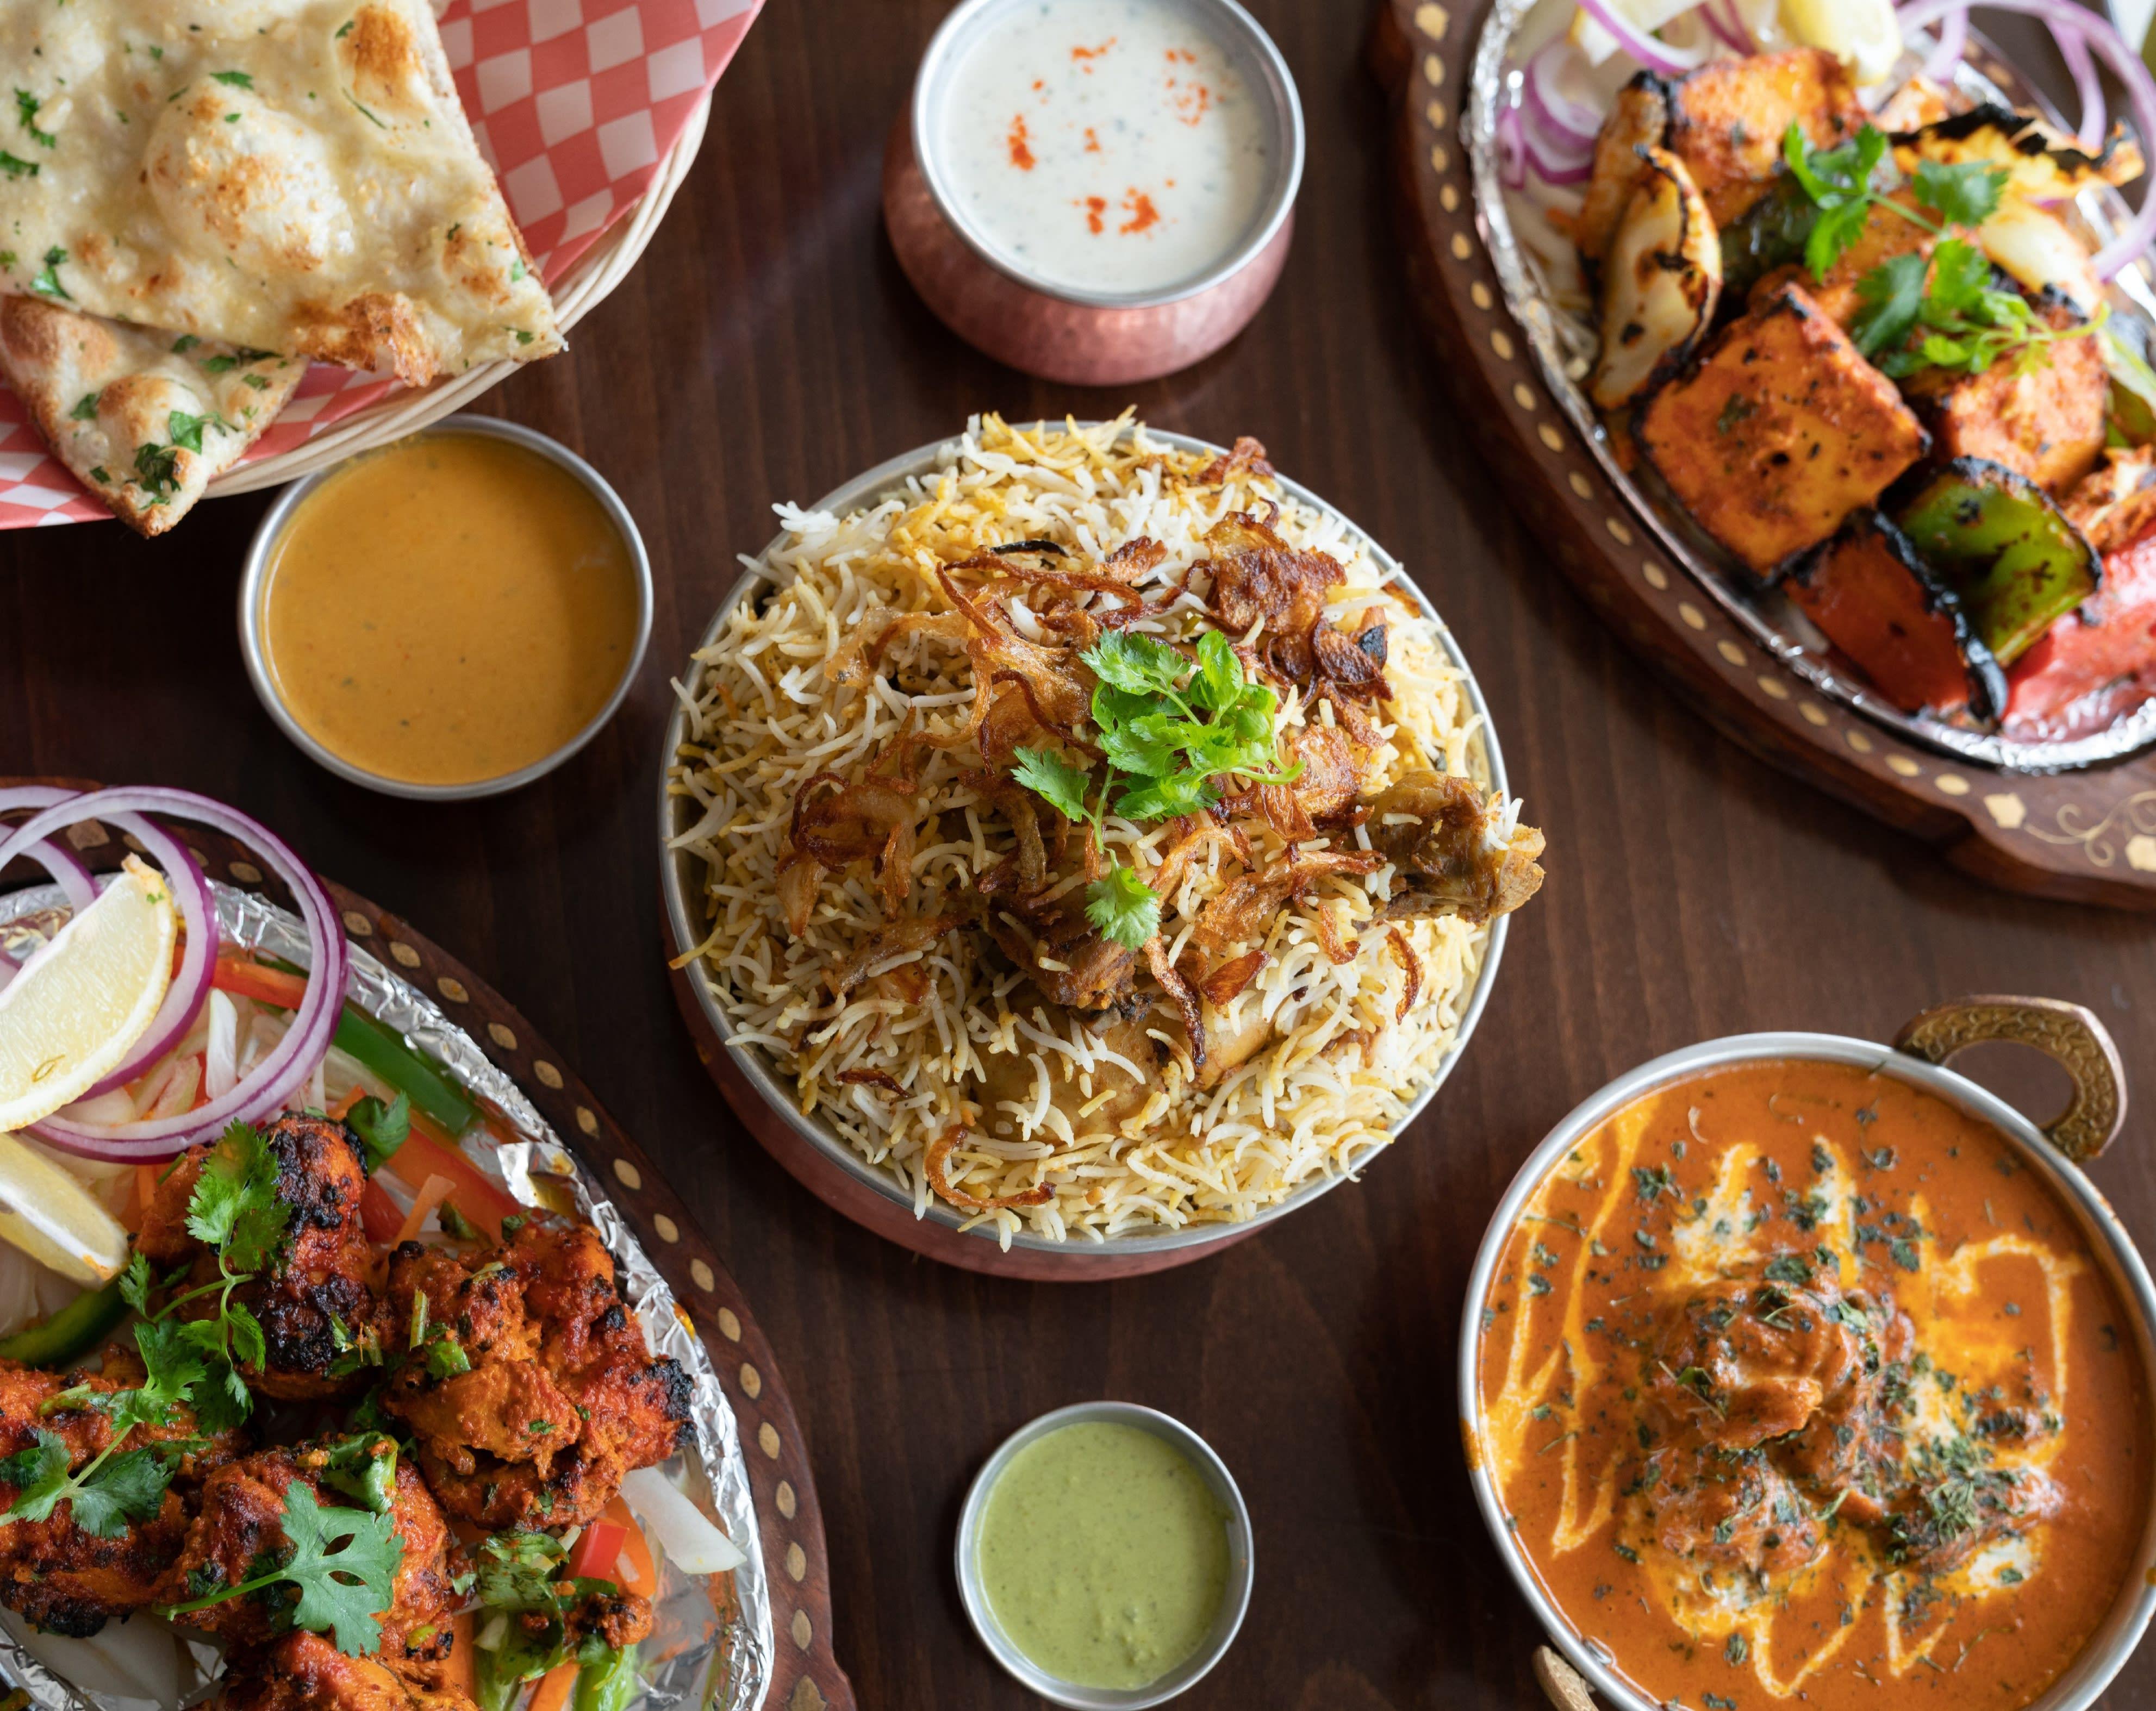 Kerala food center | Home delivery | Order online | Sri